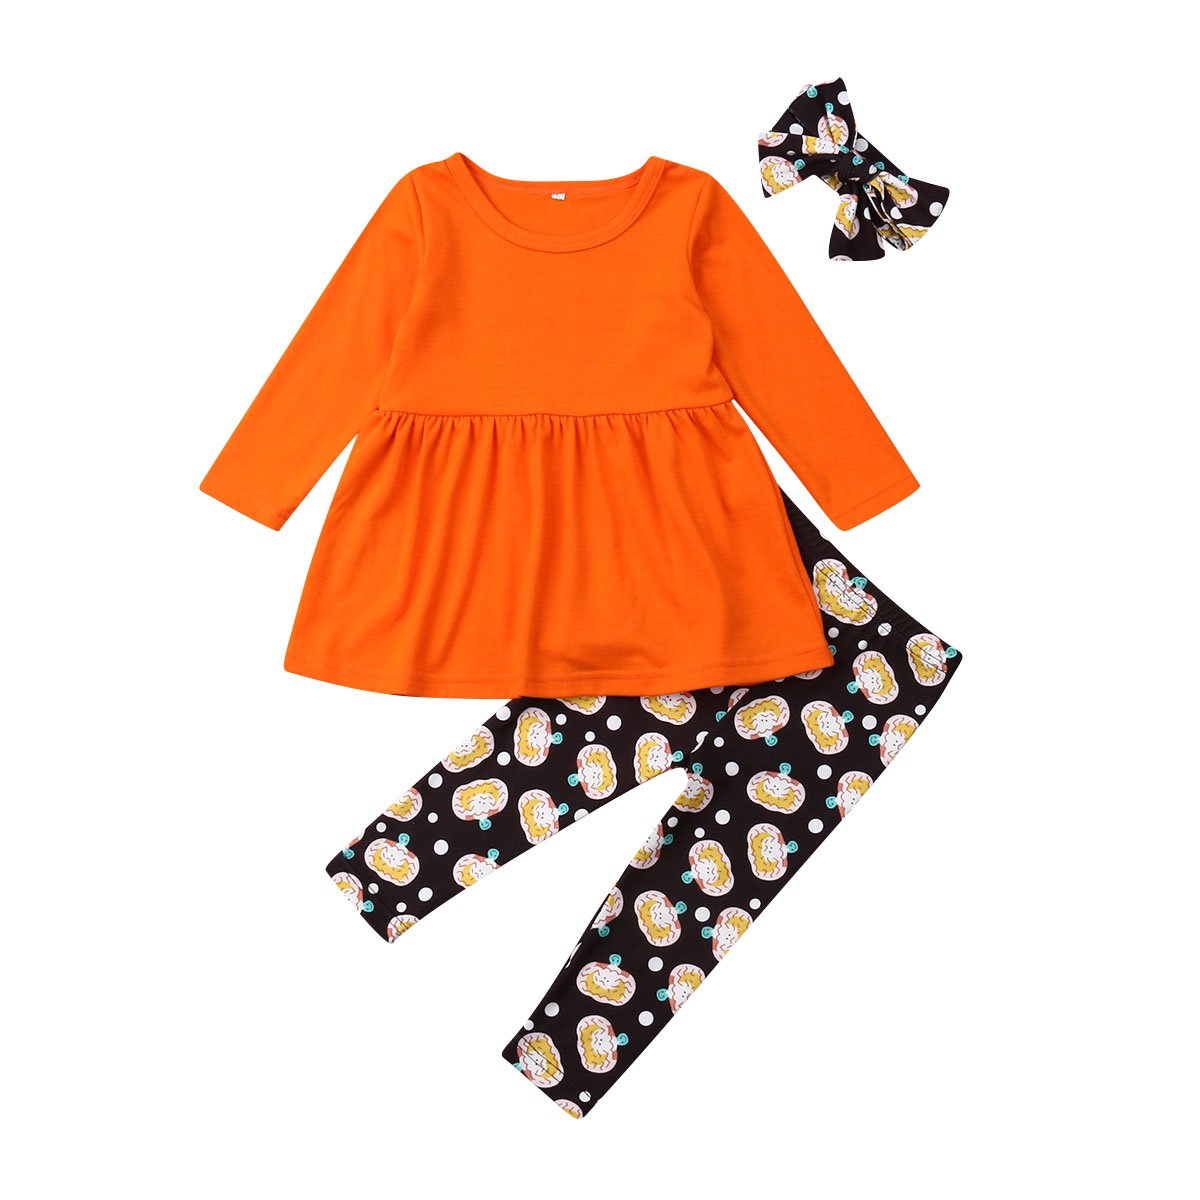 Toddler Baby Girls boys clothes Ghost Dresses Print Pants Punmpkin Headband Halloween Costume Outfits Set roupas infantis menina